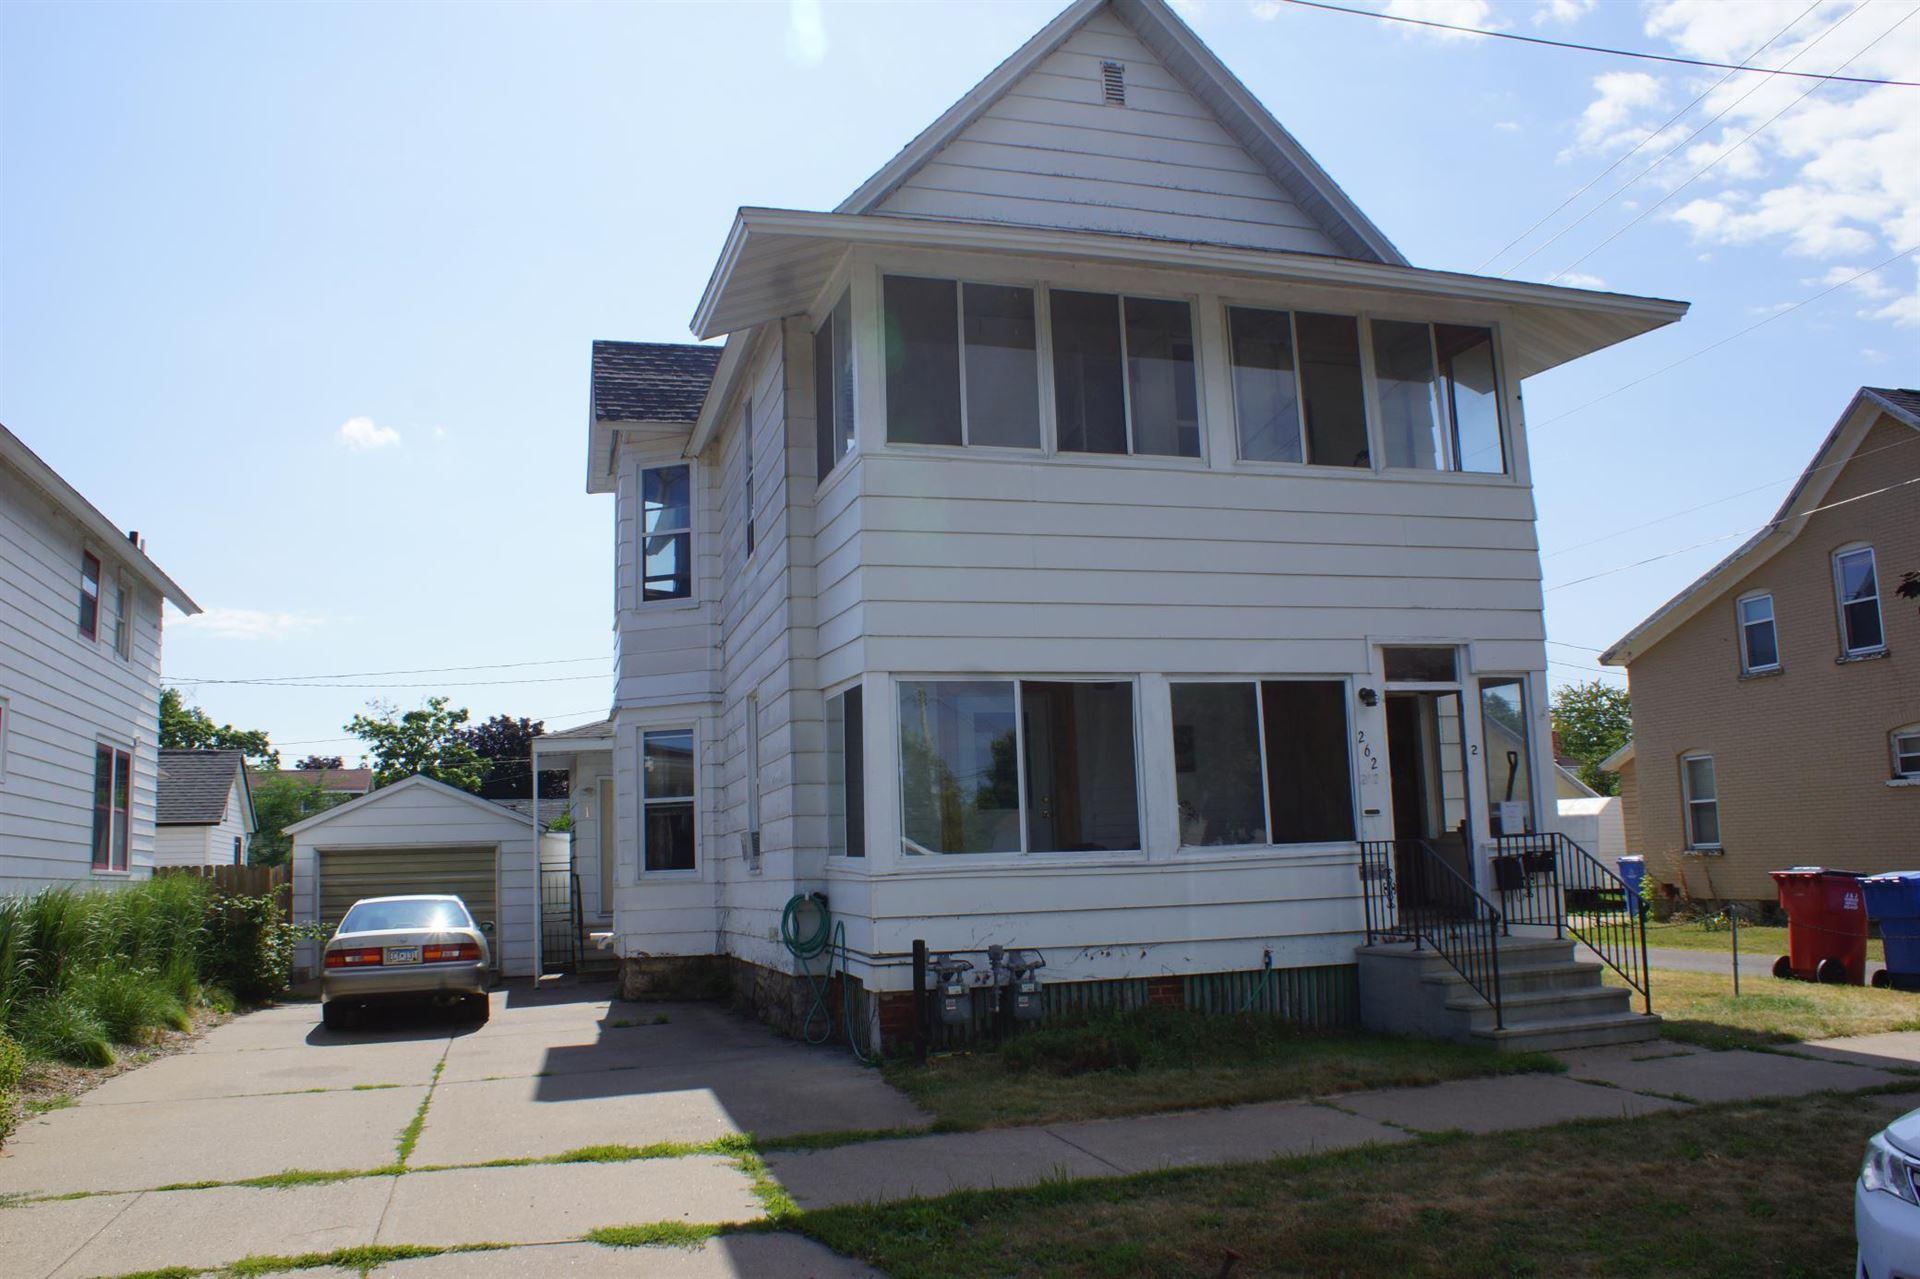 262 Laird Street, Winona, MN 55987 - MLS#: 5636822